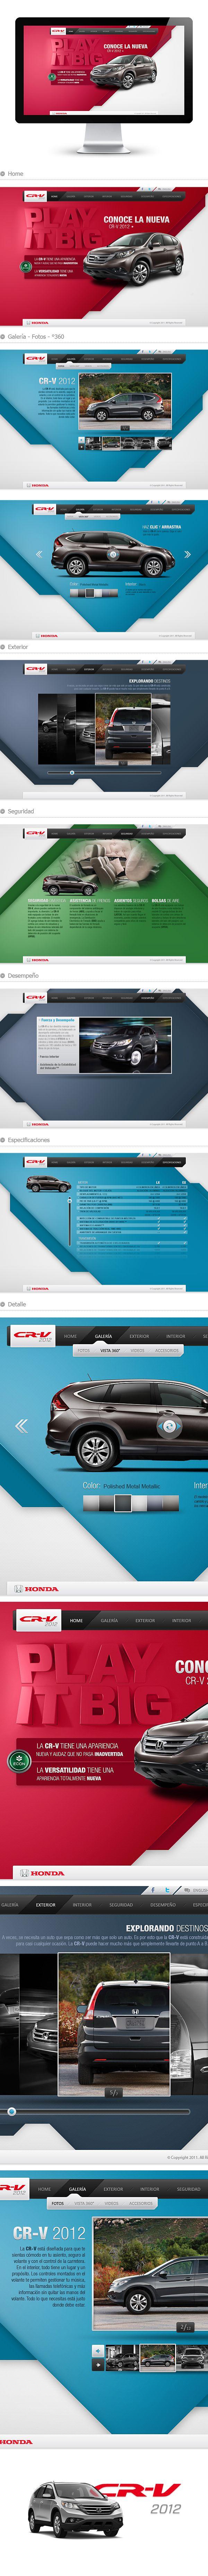 CR - V 2012 - Honda by Israel Trujillo, via Behance